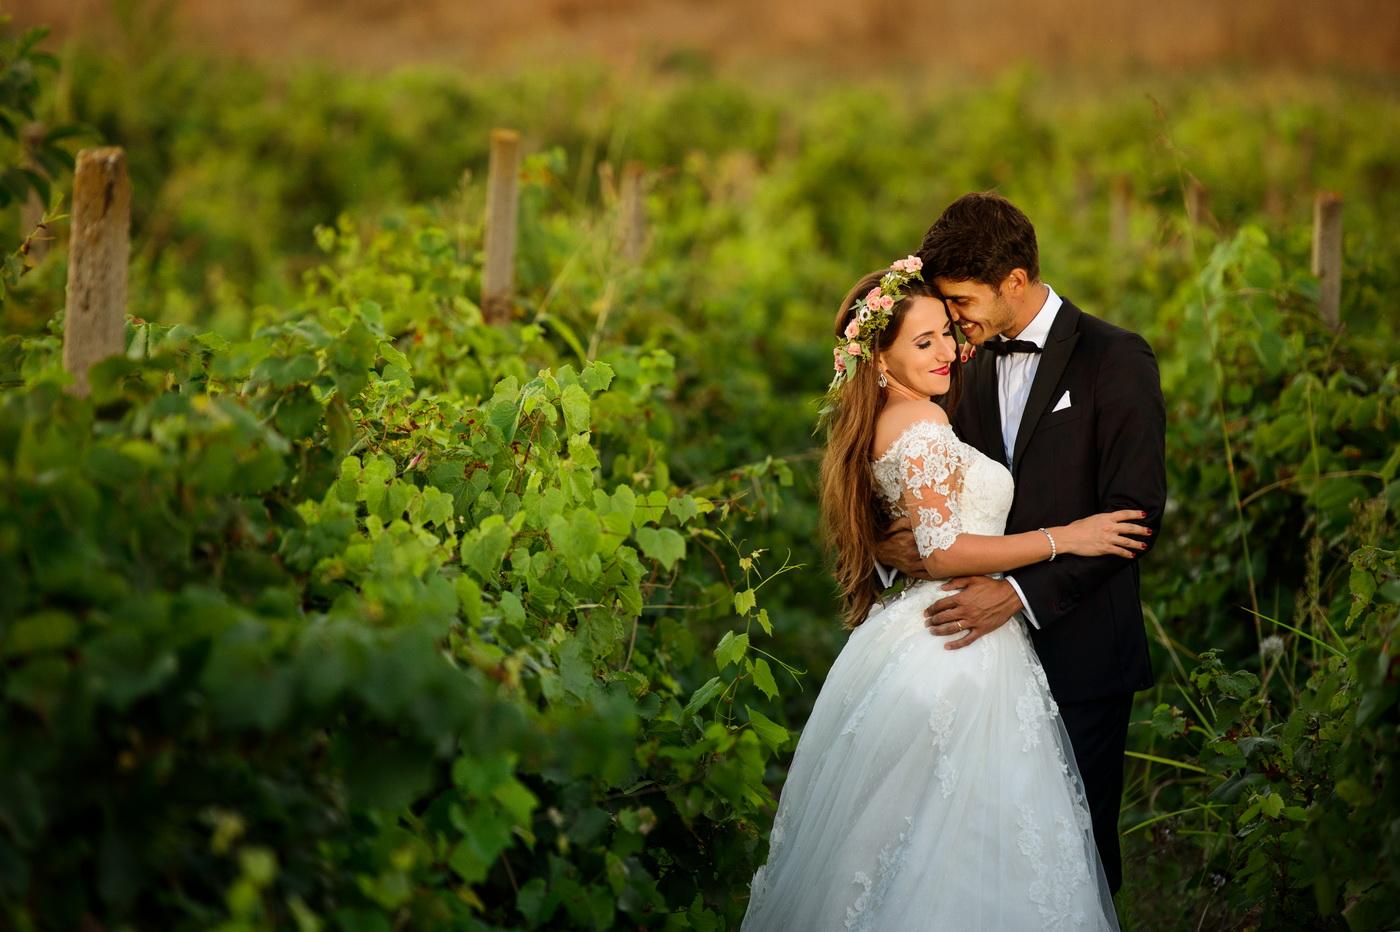 Destination Wedding Photographer_Marian Sterea_138.jpg